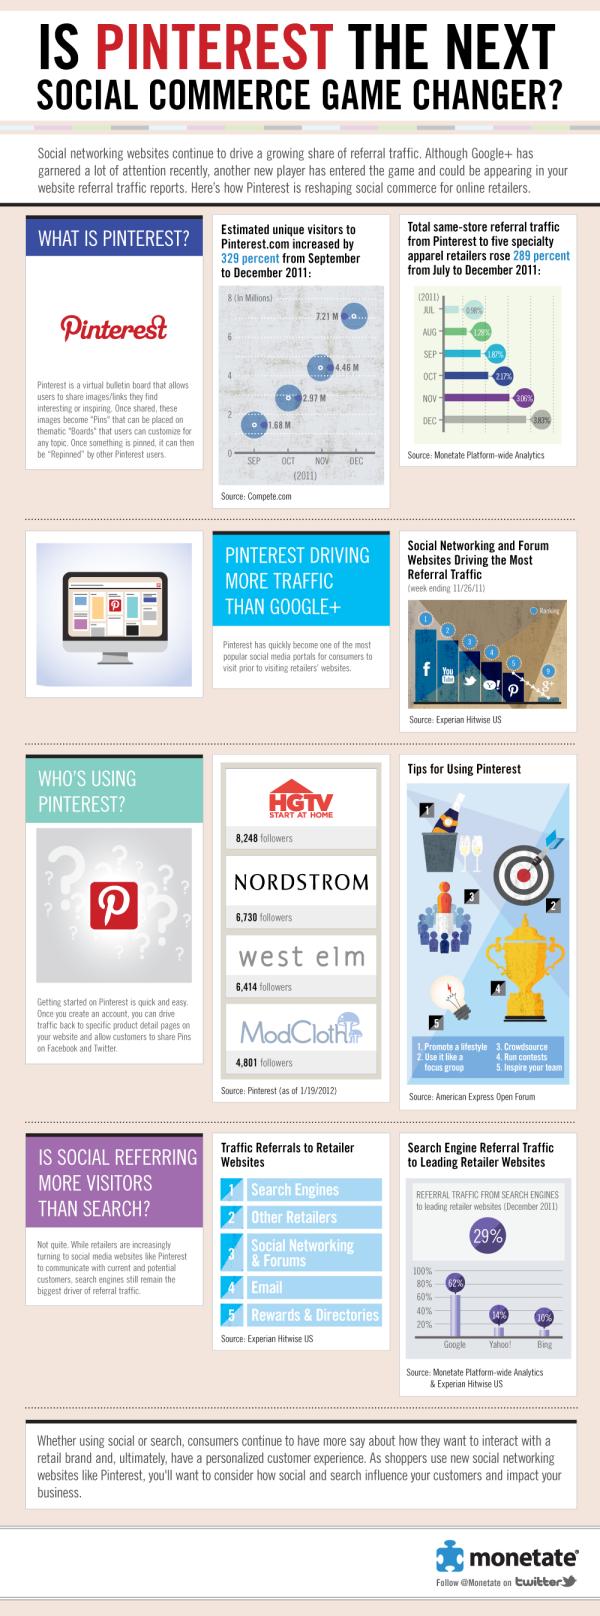 Is Pinterest The Next Social Commerce Game Changer2 resized 600